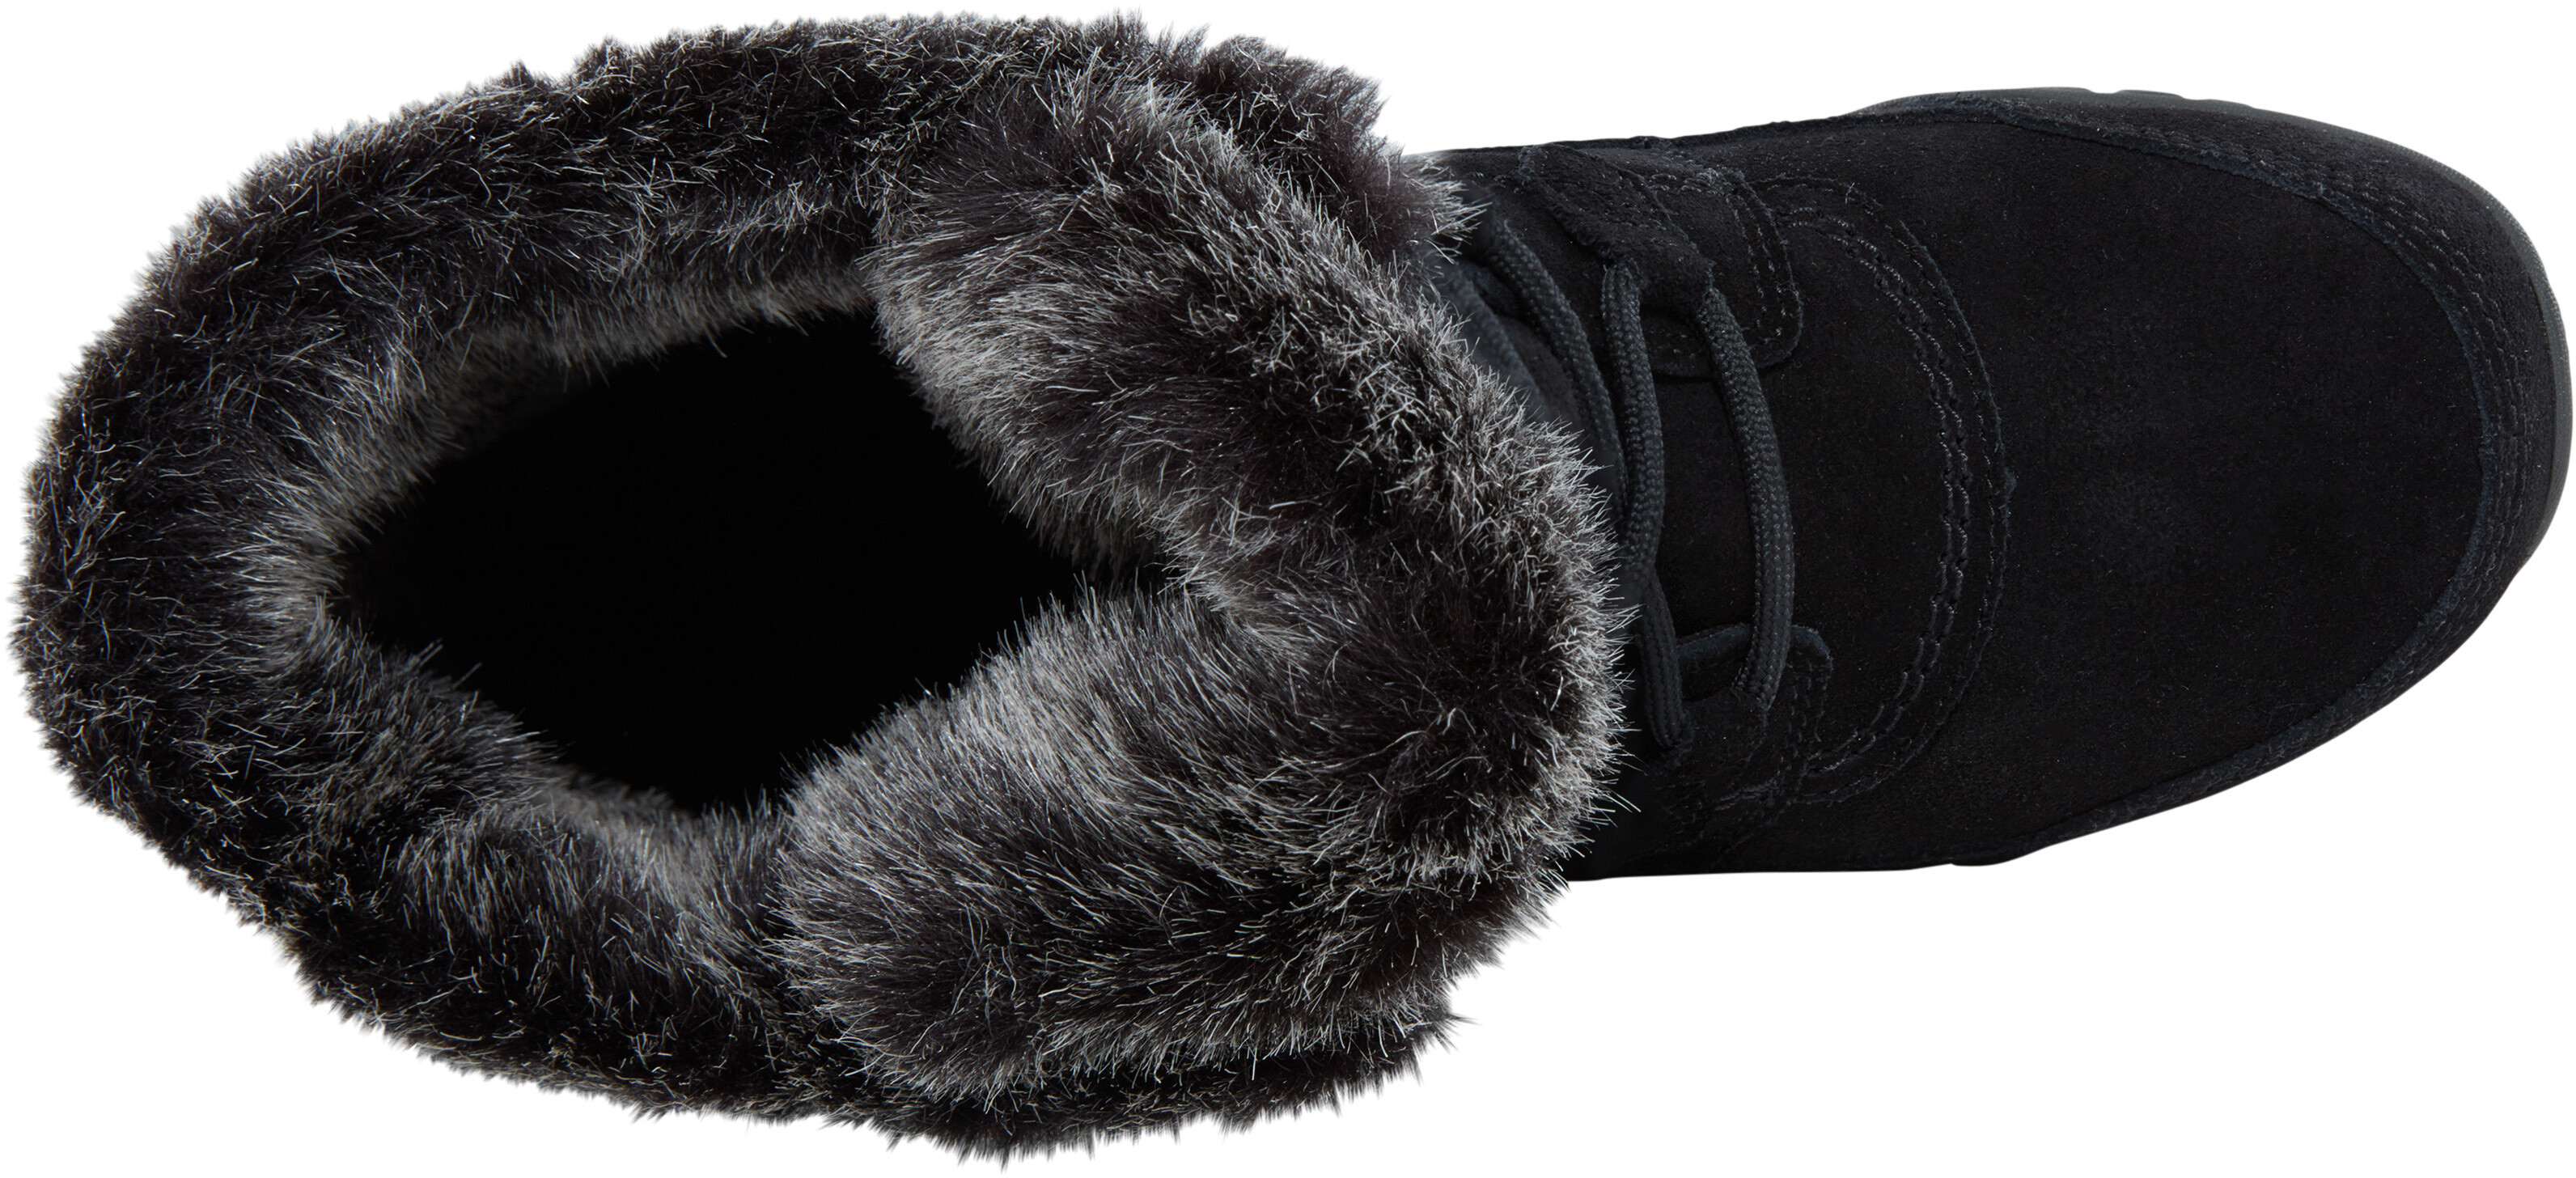 The North Face Nuptse Purna Ii Boots Women Grey Black At